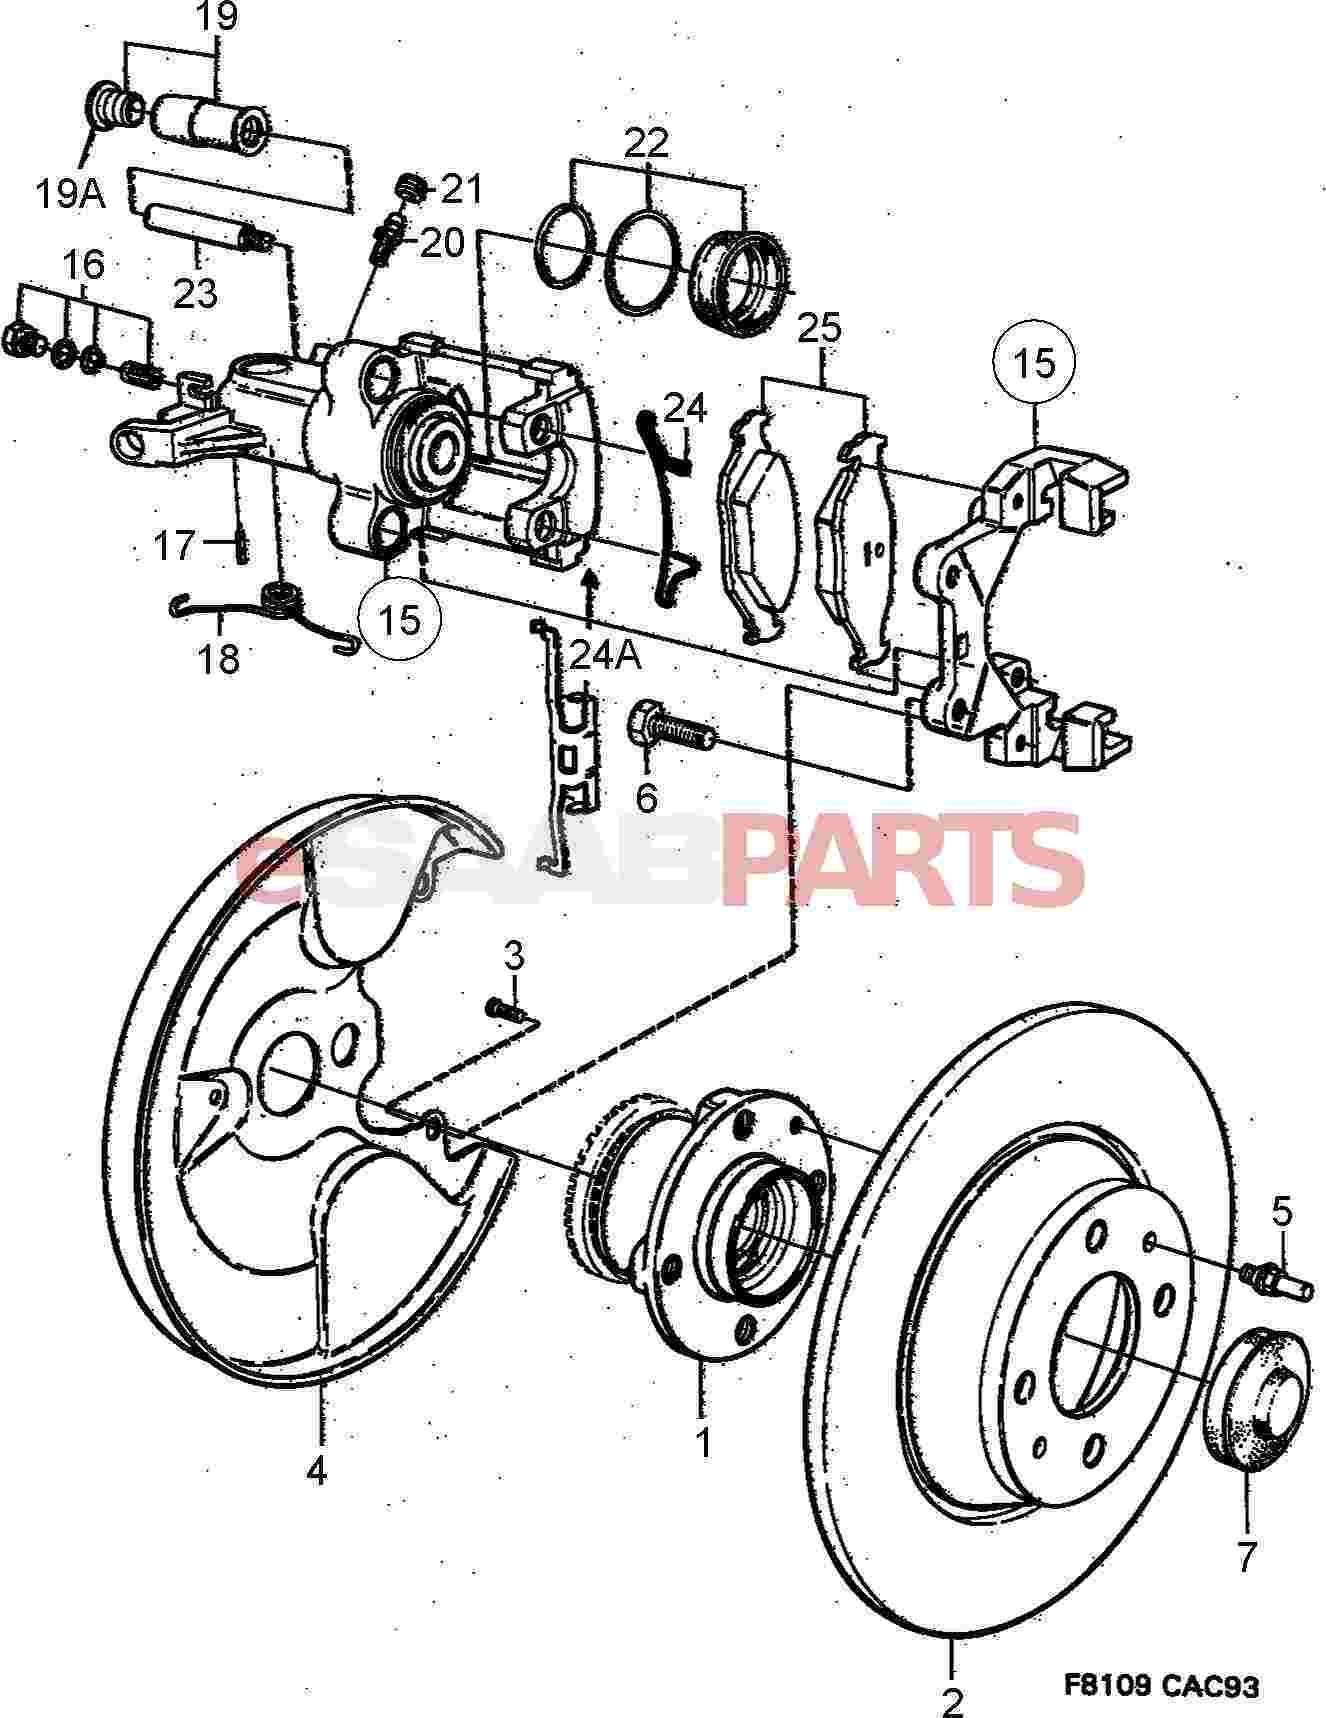 1999 mitsubishi mirage engine diagram